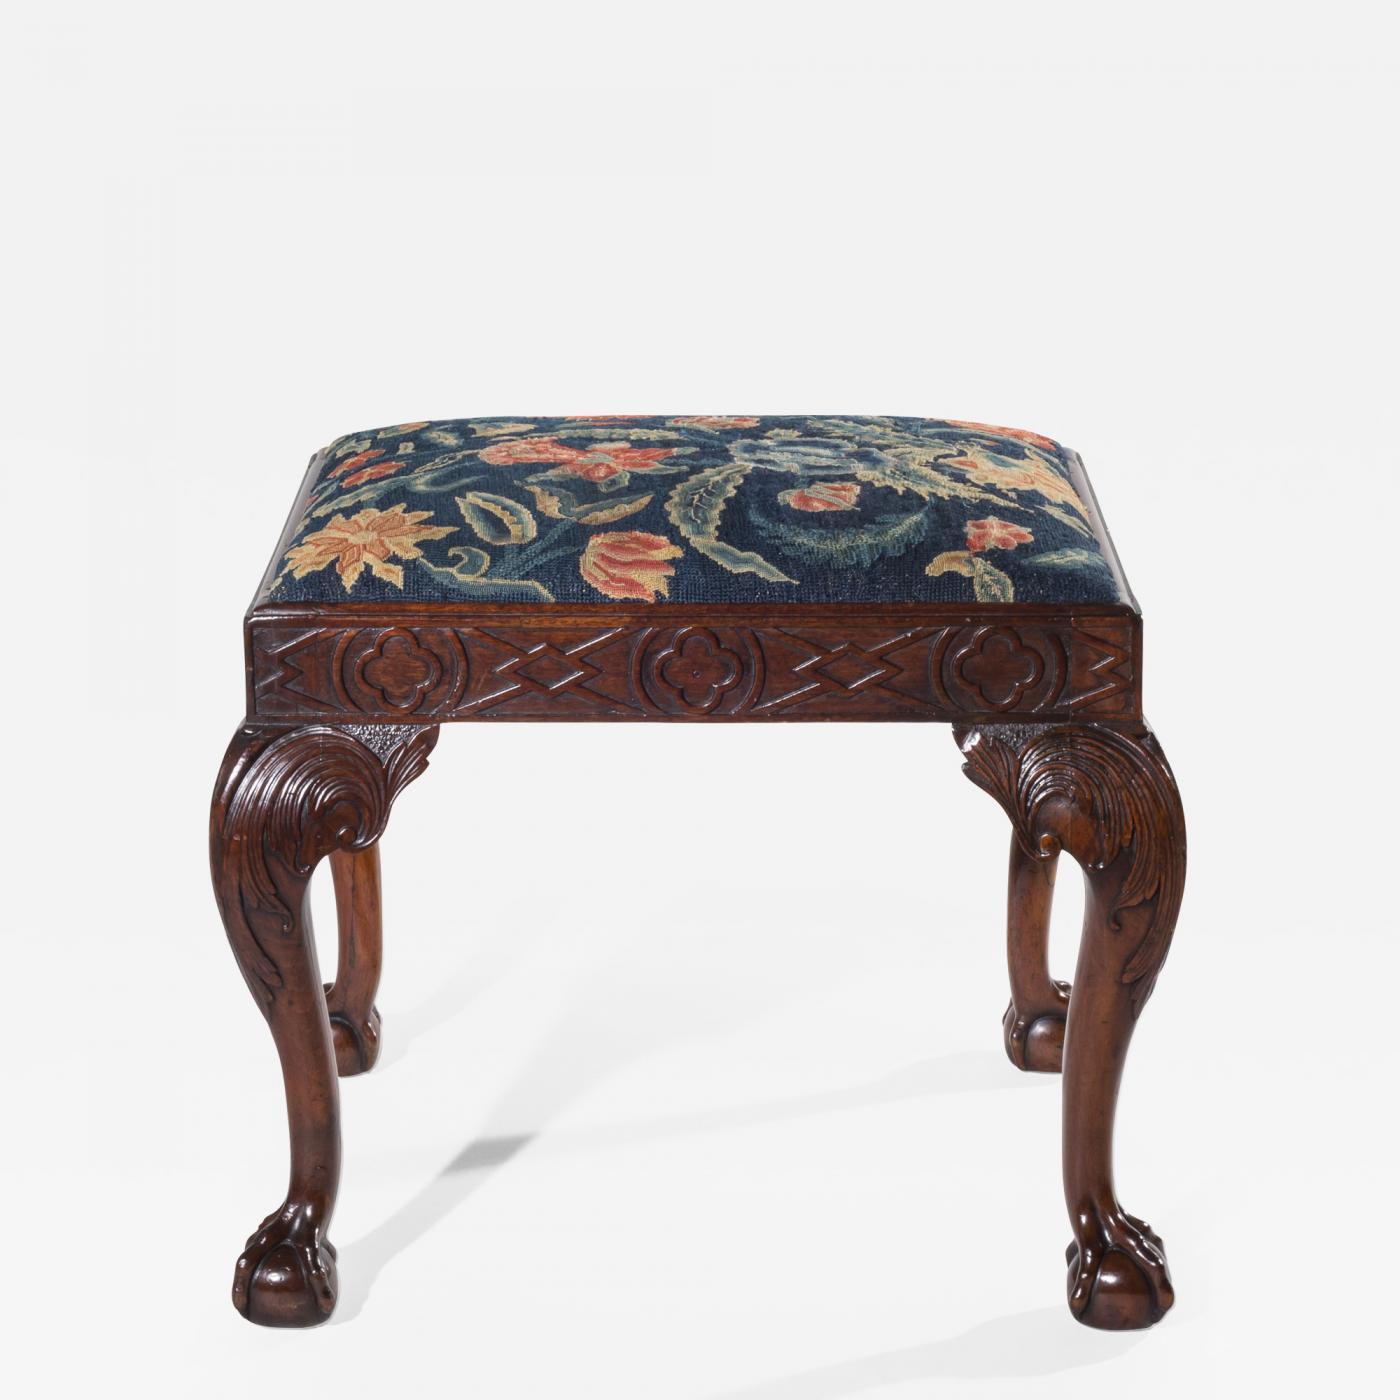 Miraculous 18Th Century Queen Anne Walnut Needlepoint Claw Foot Stool Machost Co Dining Chair Design Ideas Machostcouk